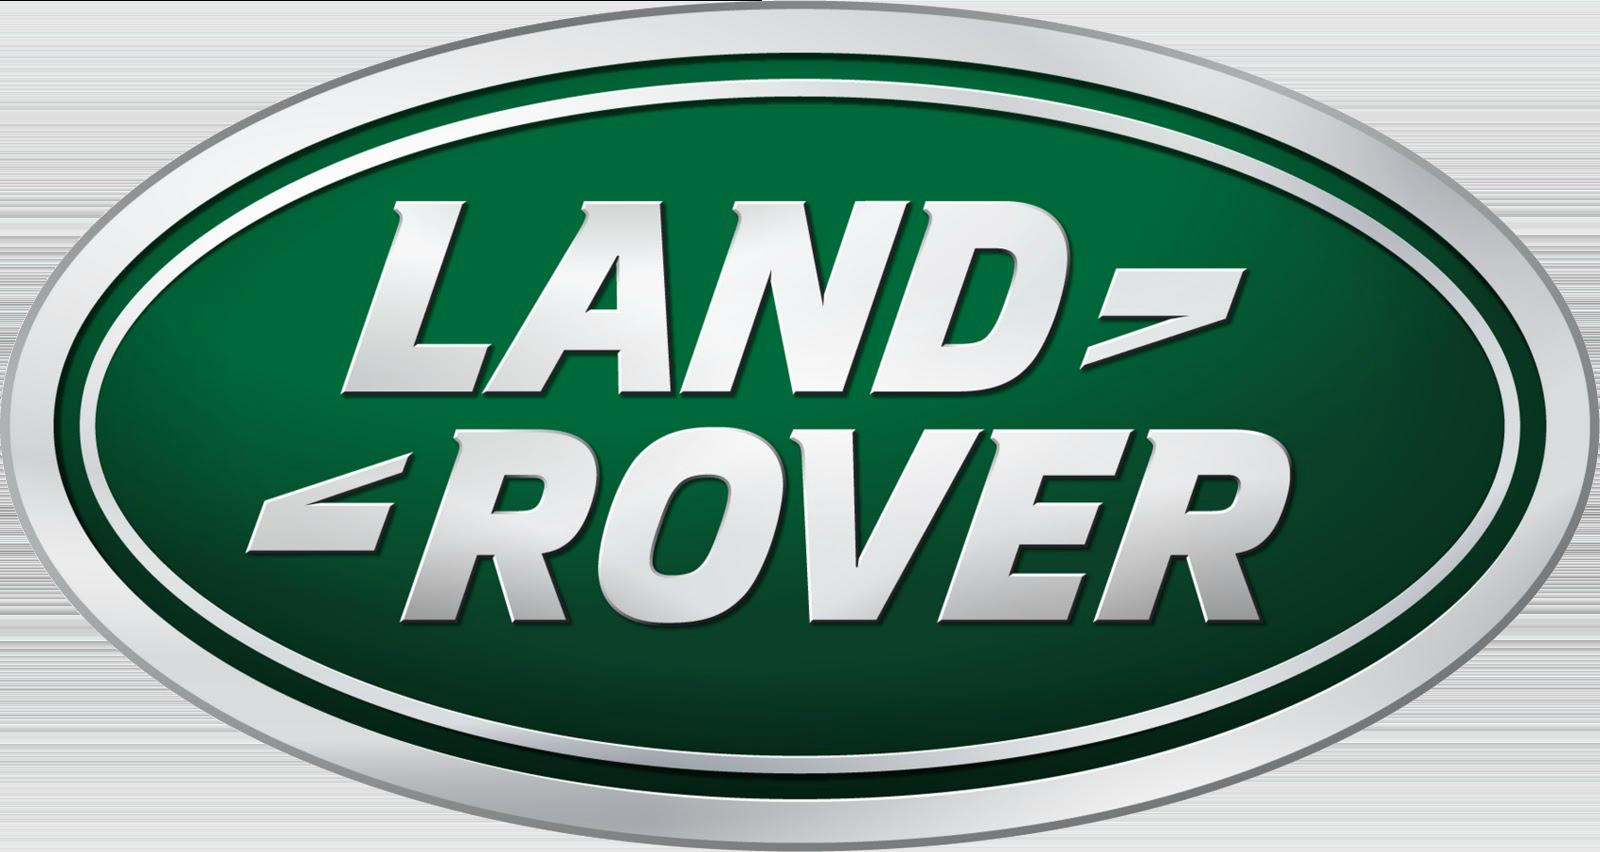 Вал рулевой LAND ROVER QLB500070